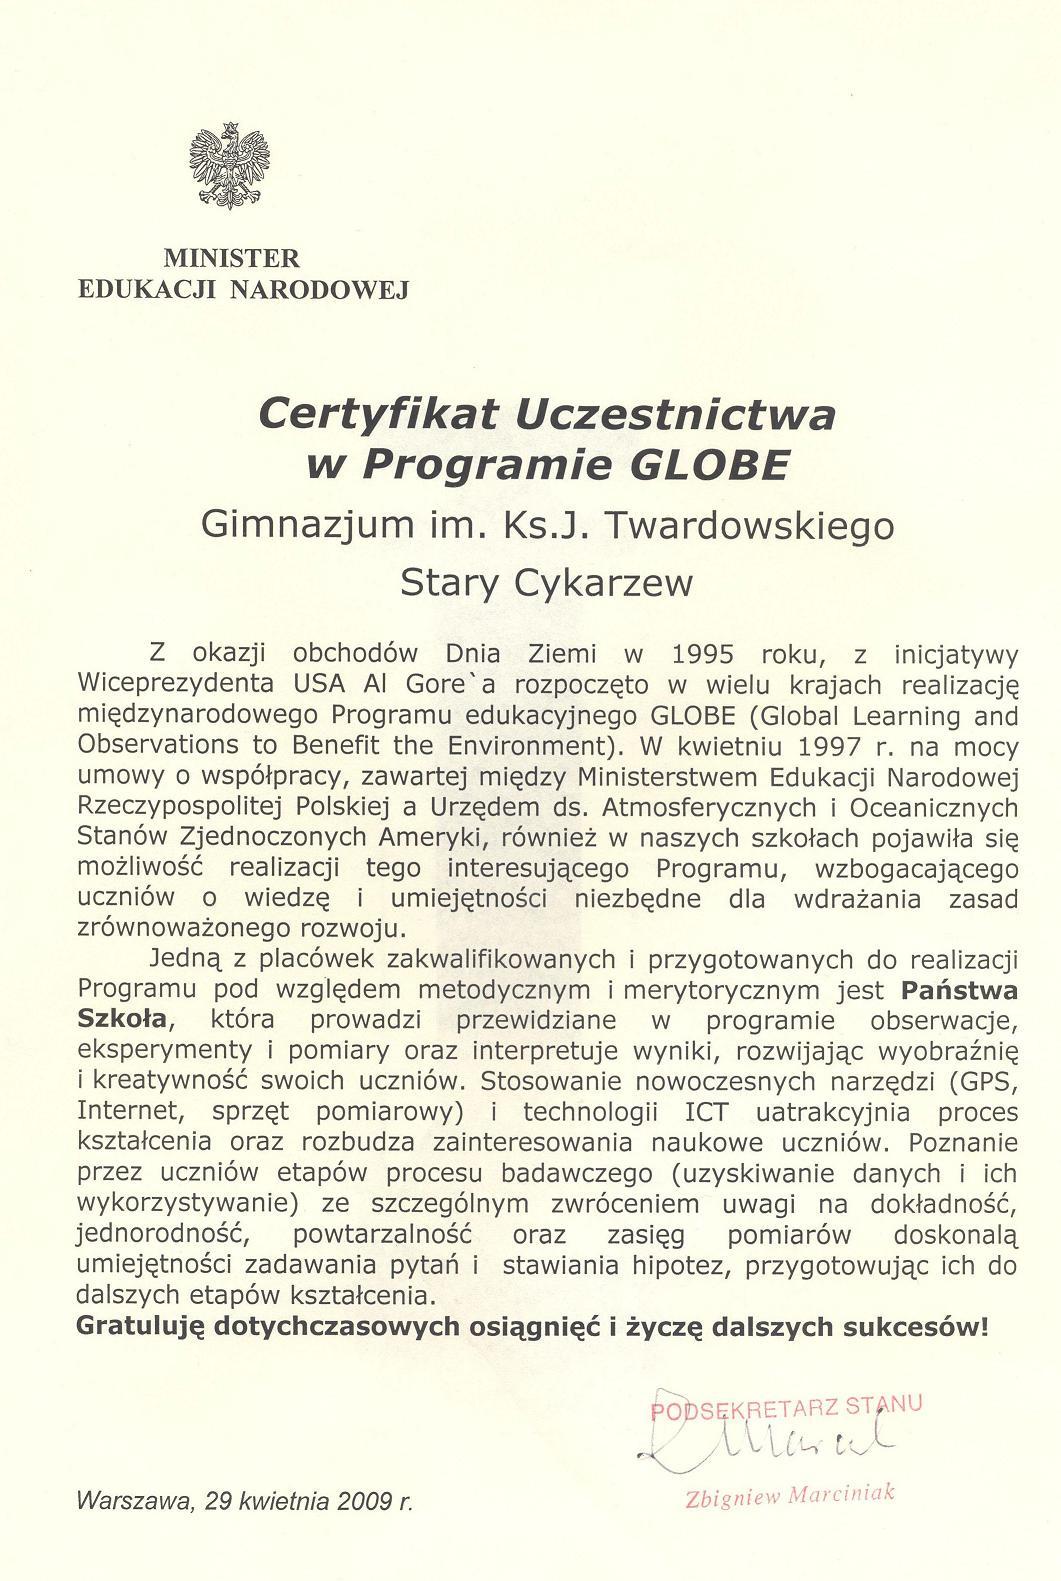 http://globe.gridw.pl/